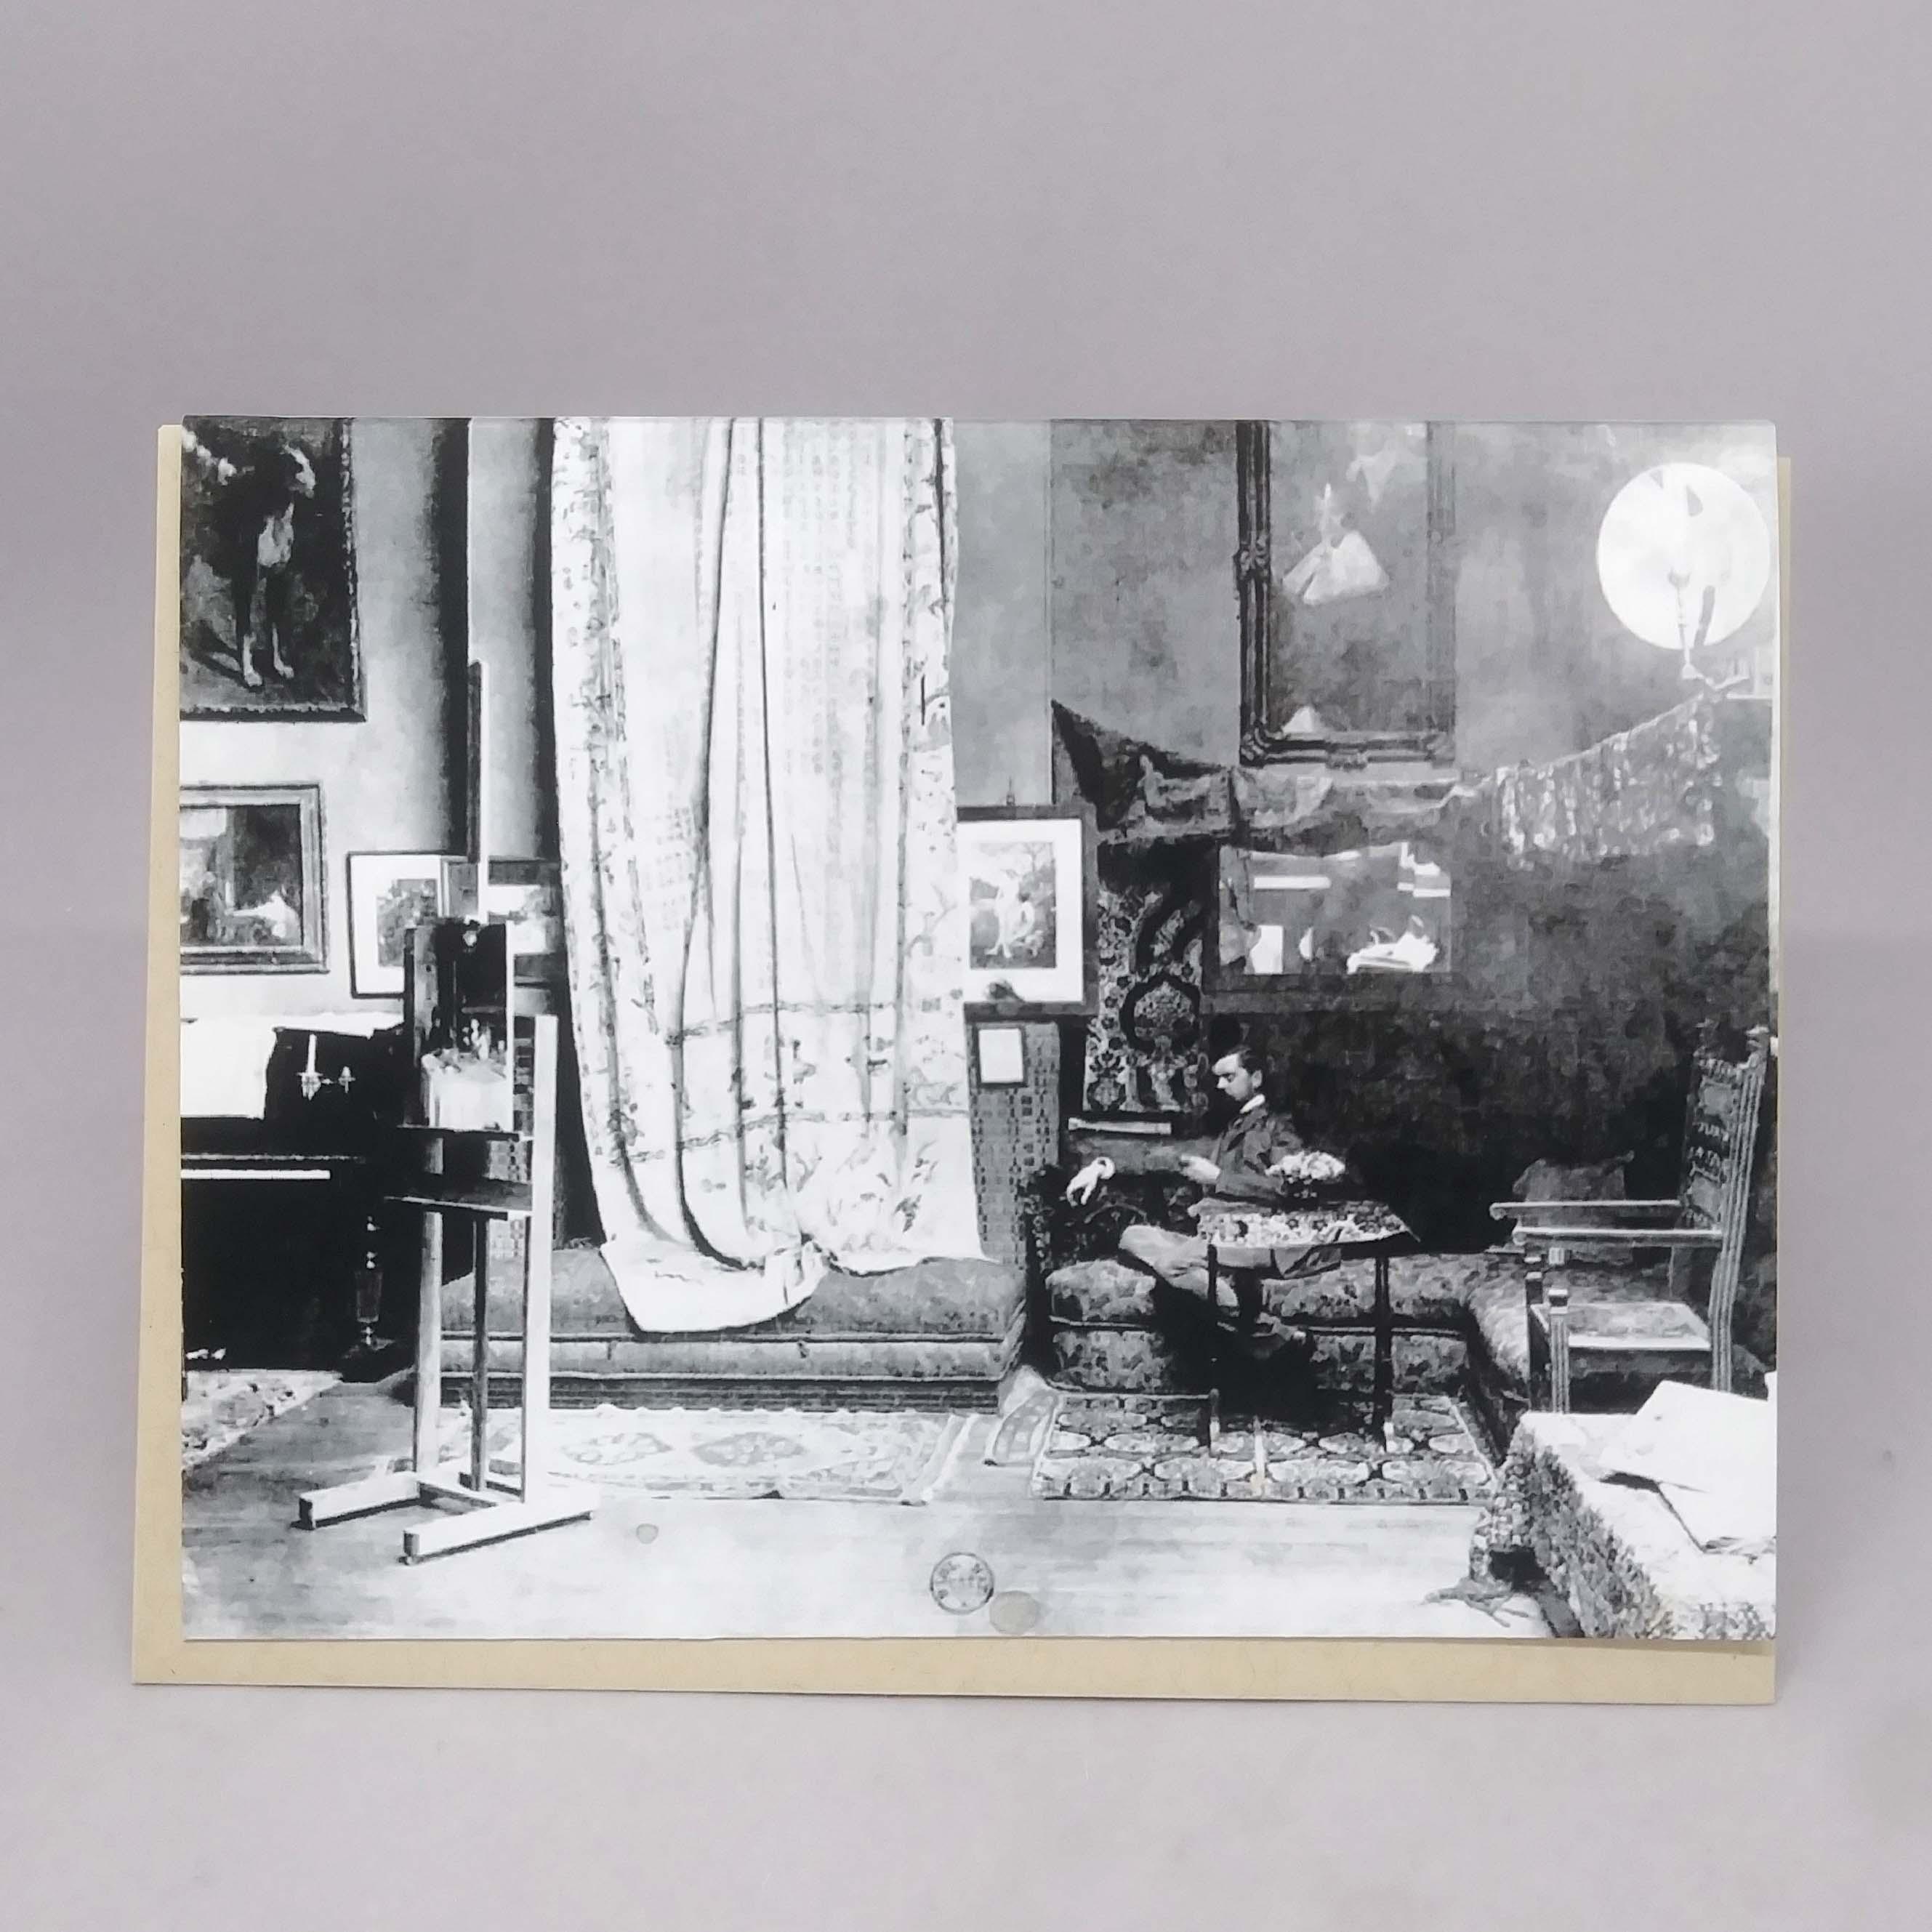 Studio Portrait - John Singer Sargent